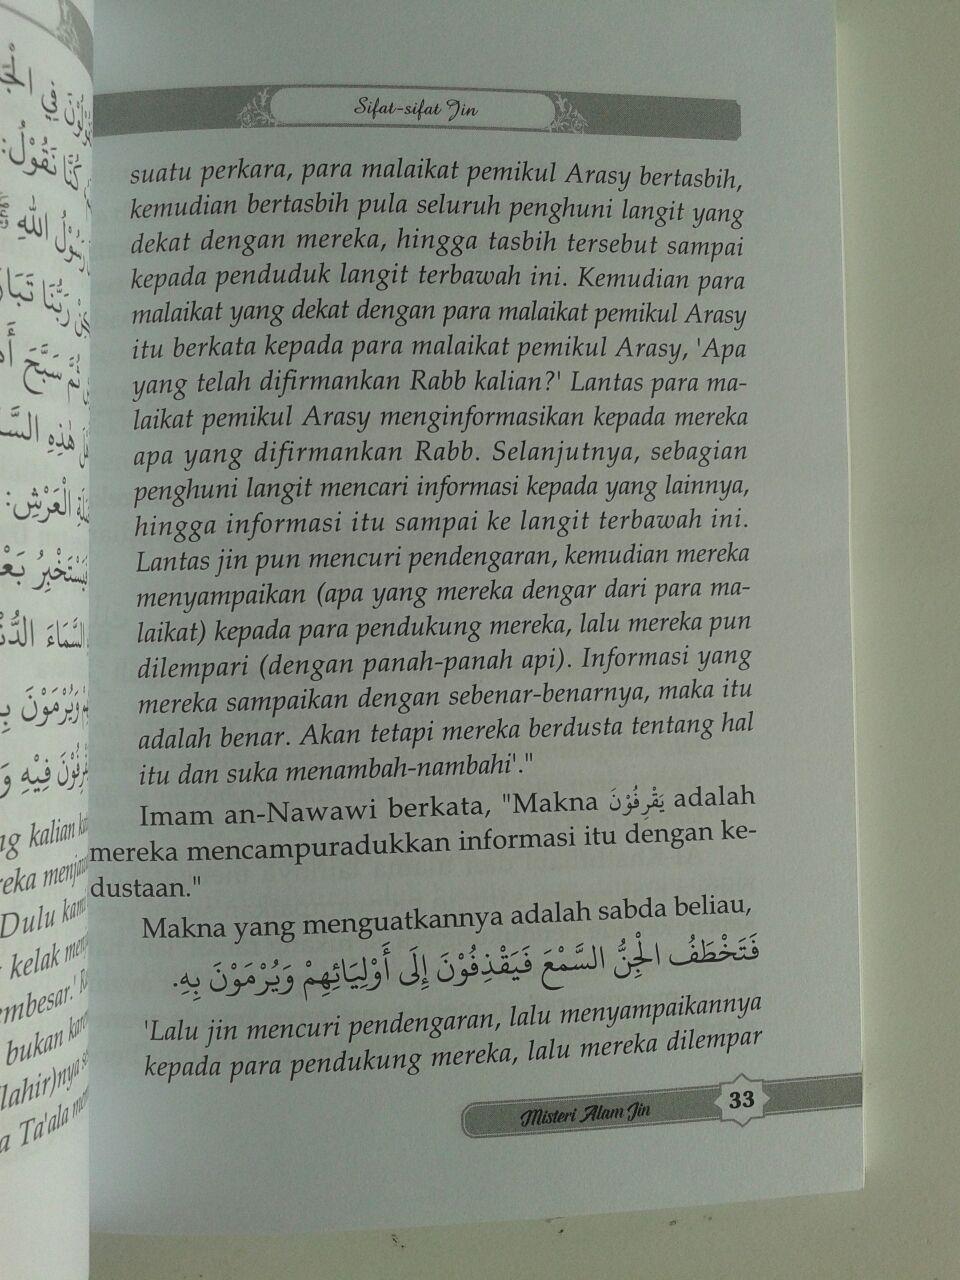 Buku Misteri Alam Jin Berdasarkan Al-Quran dan As-Sunnah isi 3